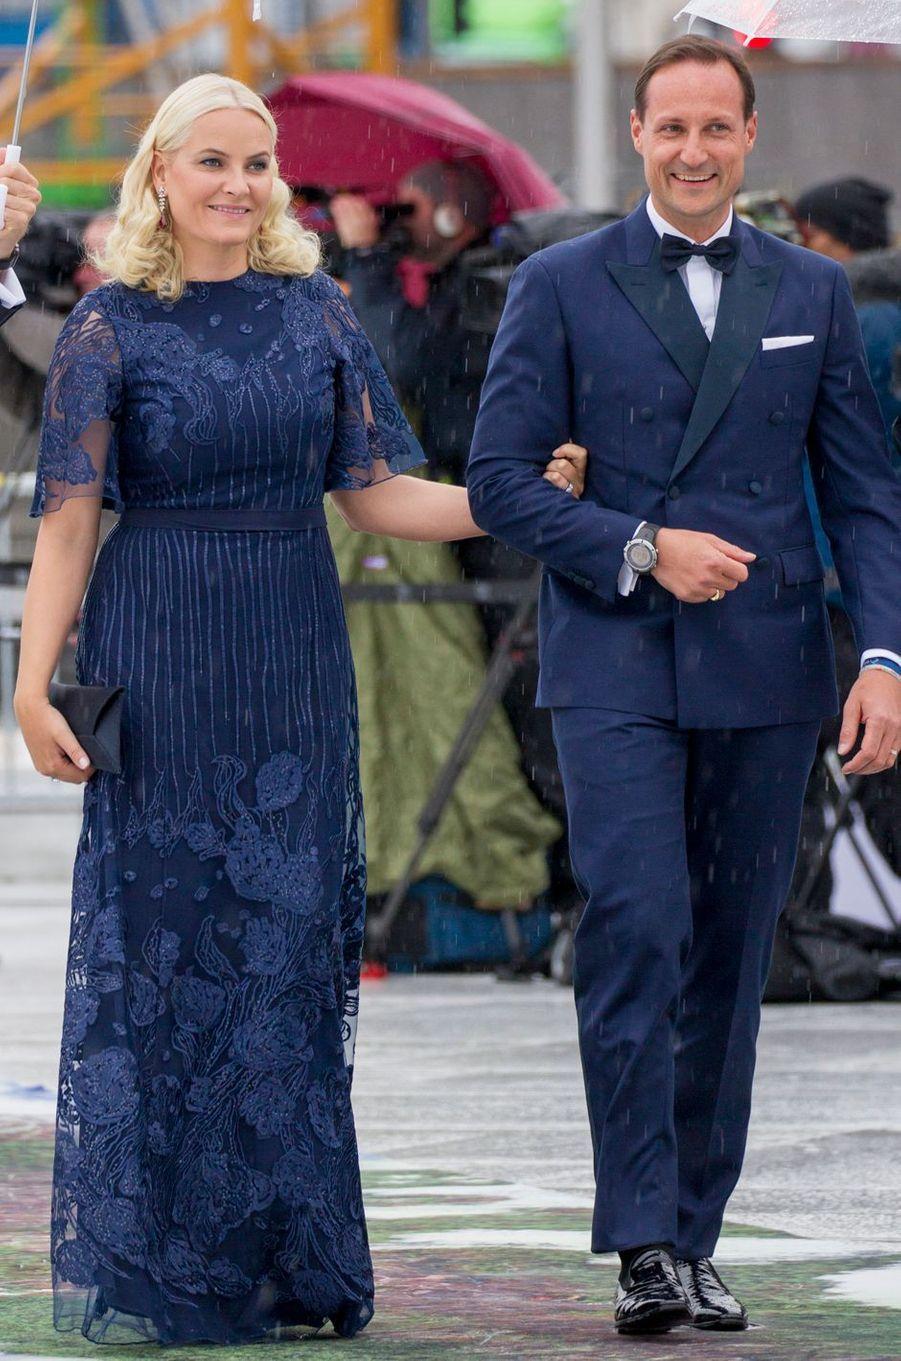 La princesse Mette-Marit de Norvège en Marthe Krogh, le 10 mai 2017